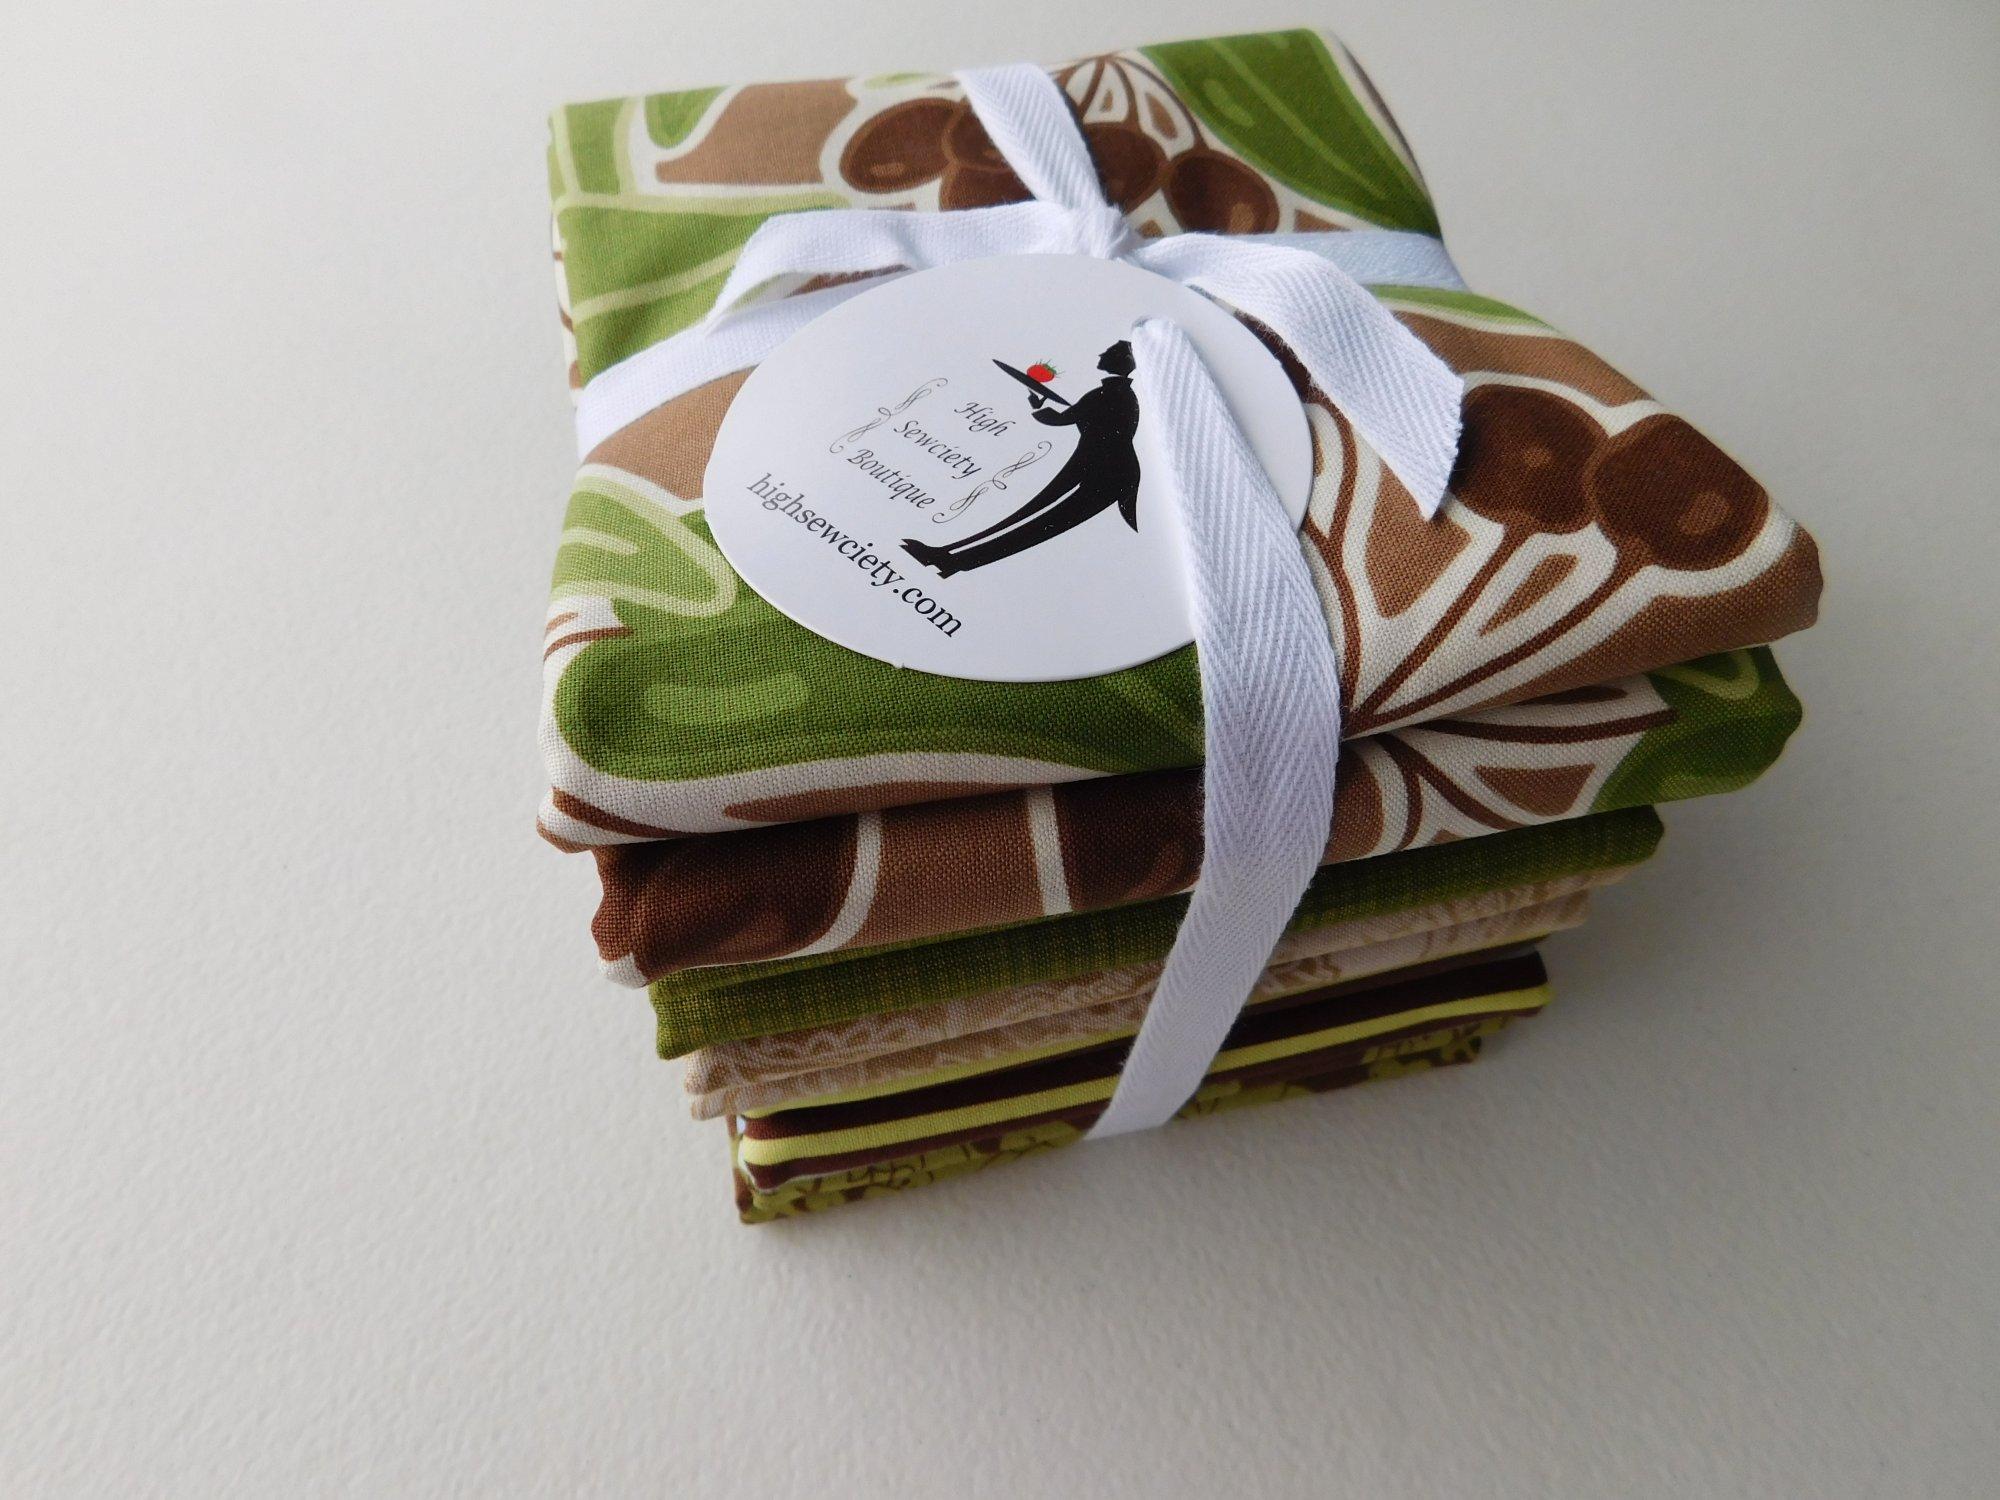 Modern Avocado Green and Brown 1/2 Yard Fabric Bundle